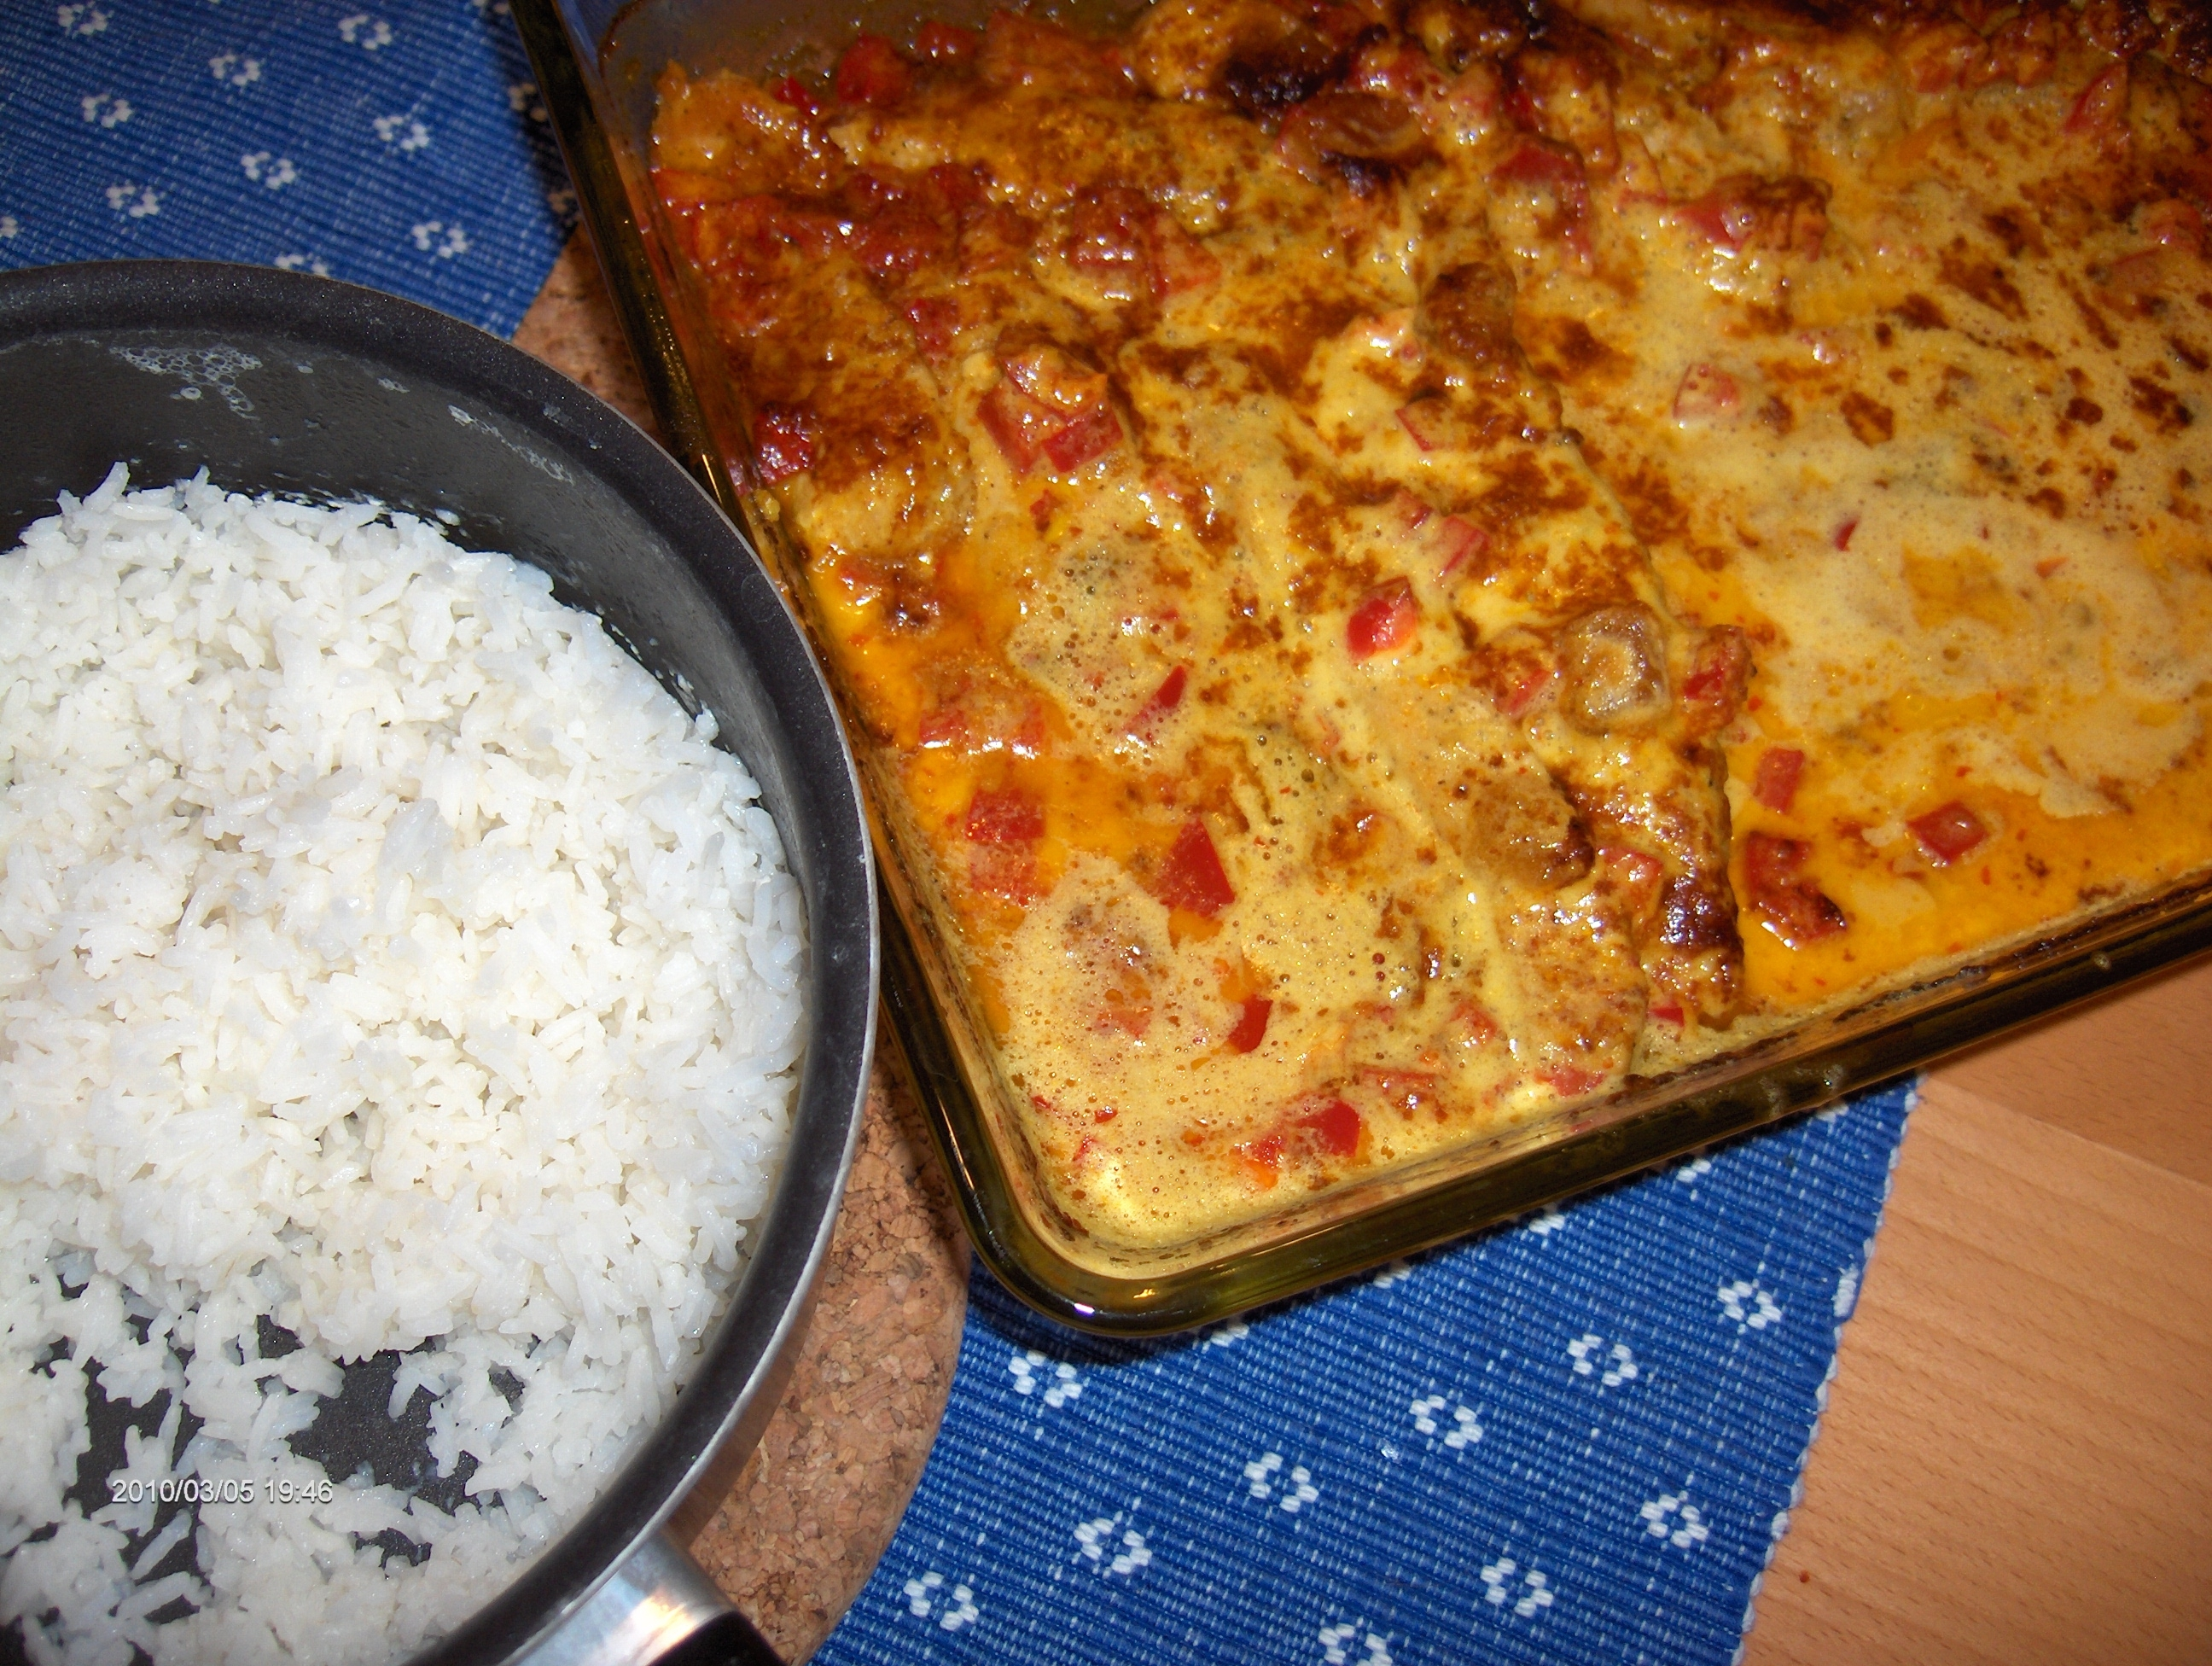 kyckling paprika grädde curry sambal vitlök mango chutney ugn 225 stek